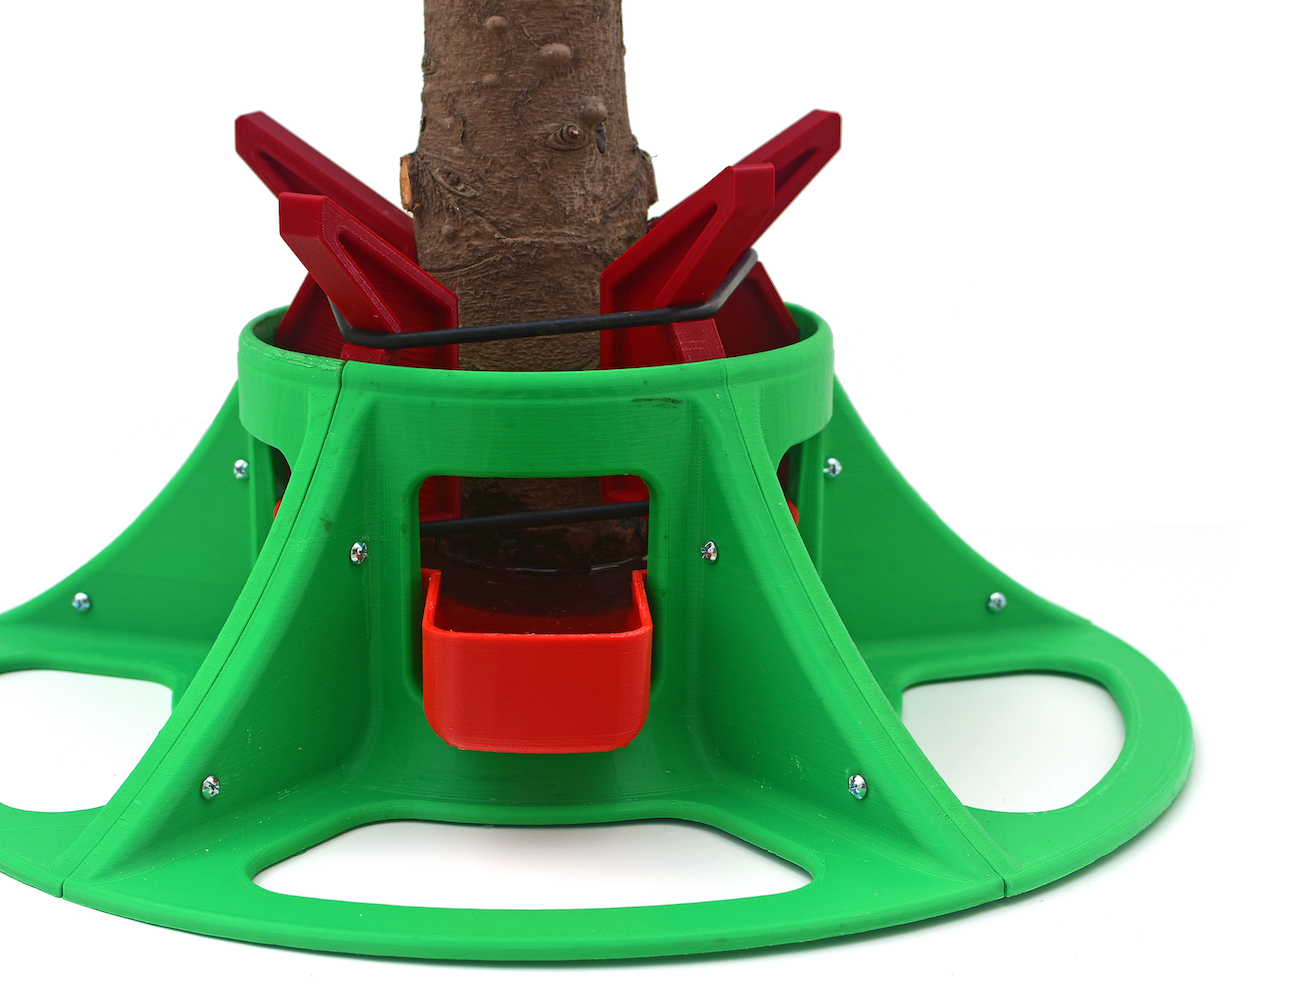 Eazy Treezy Christmas Tree Stand